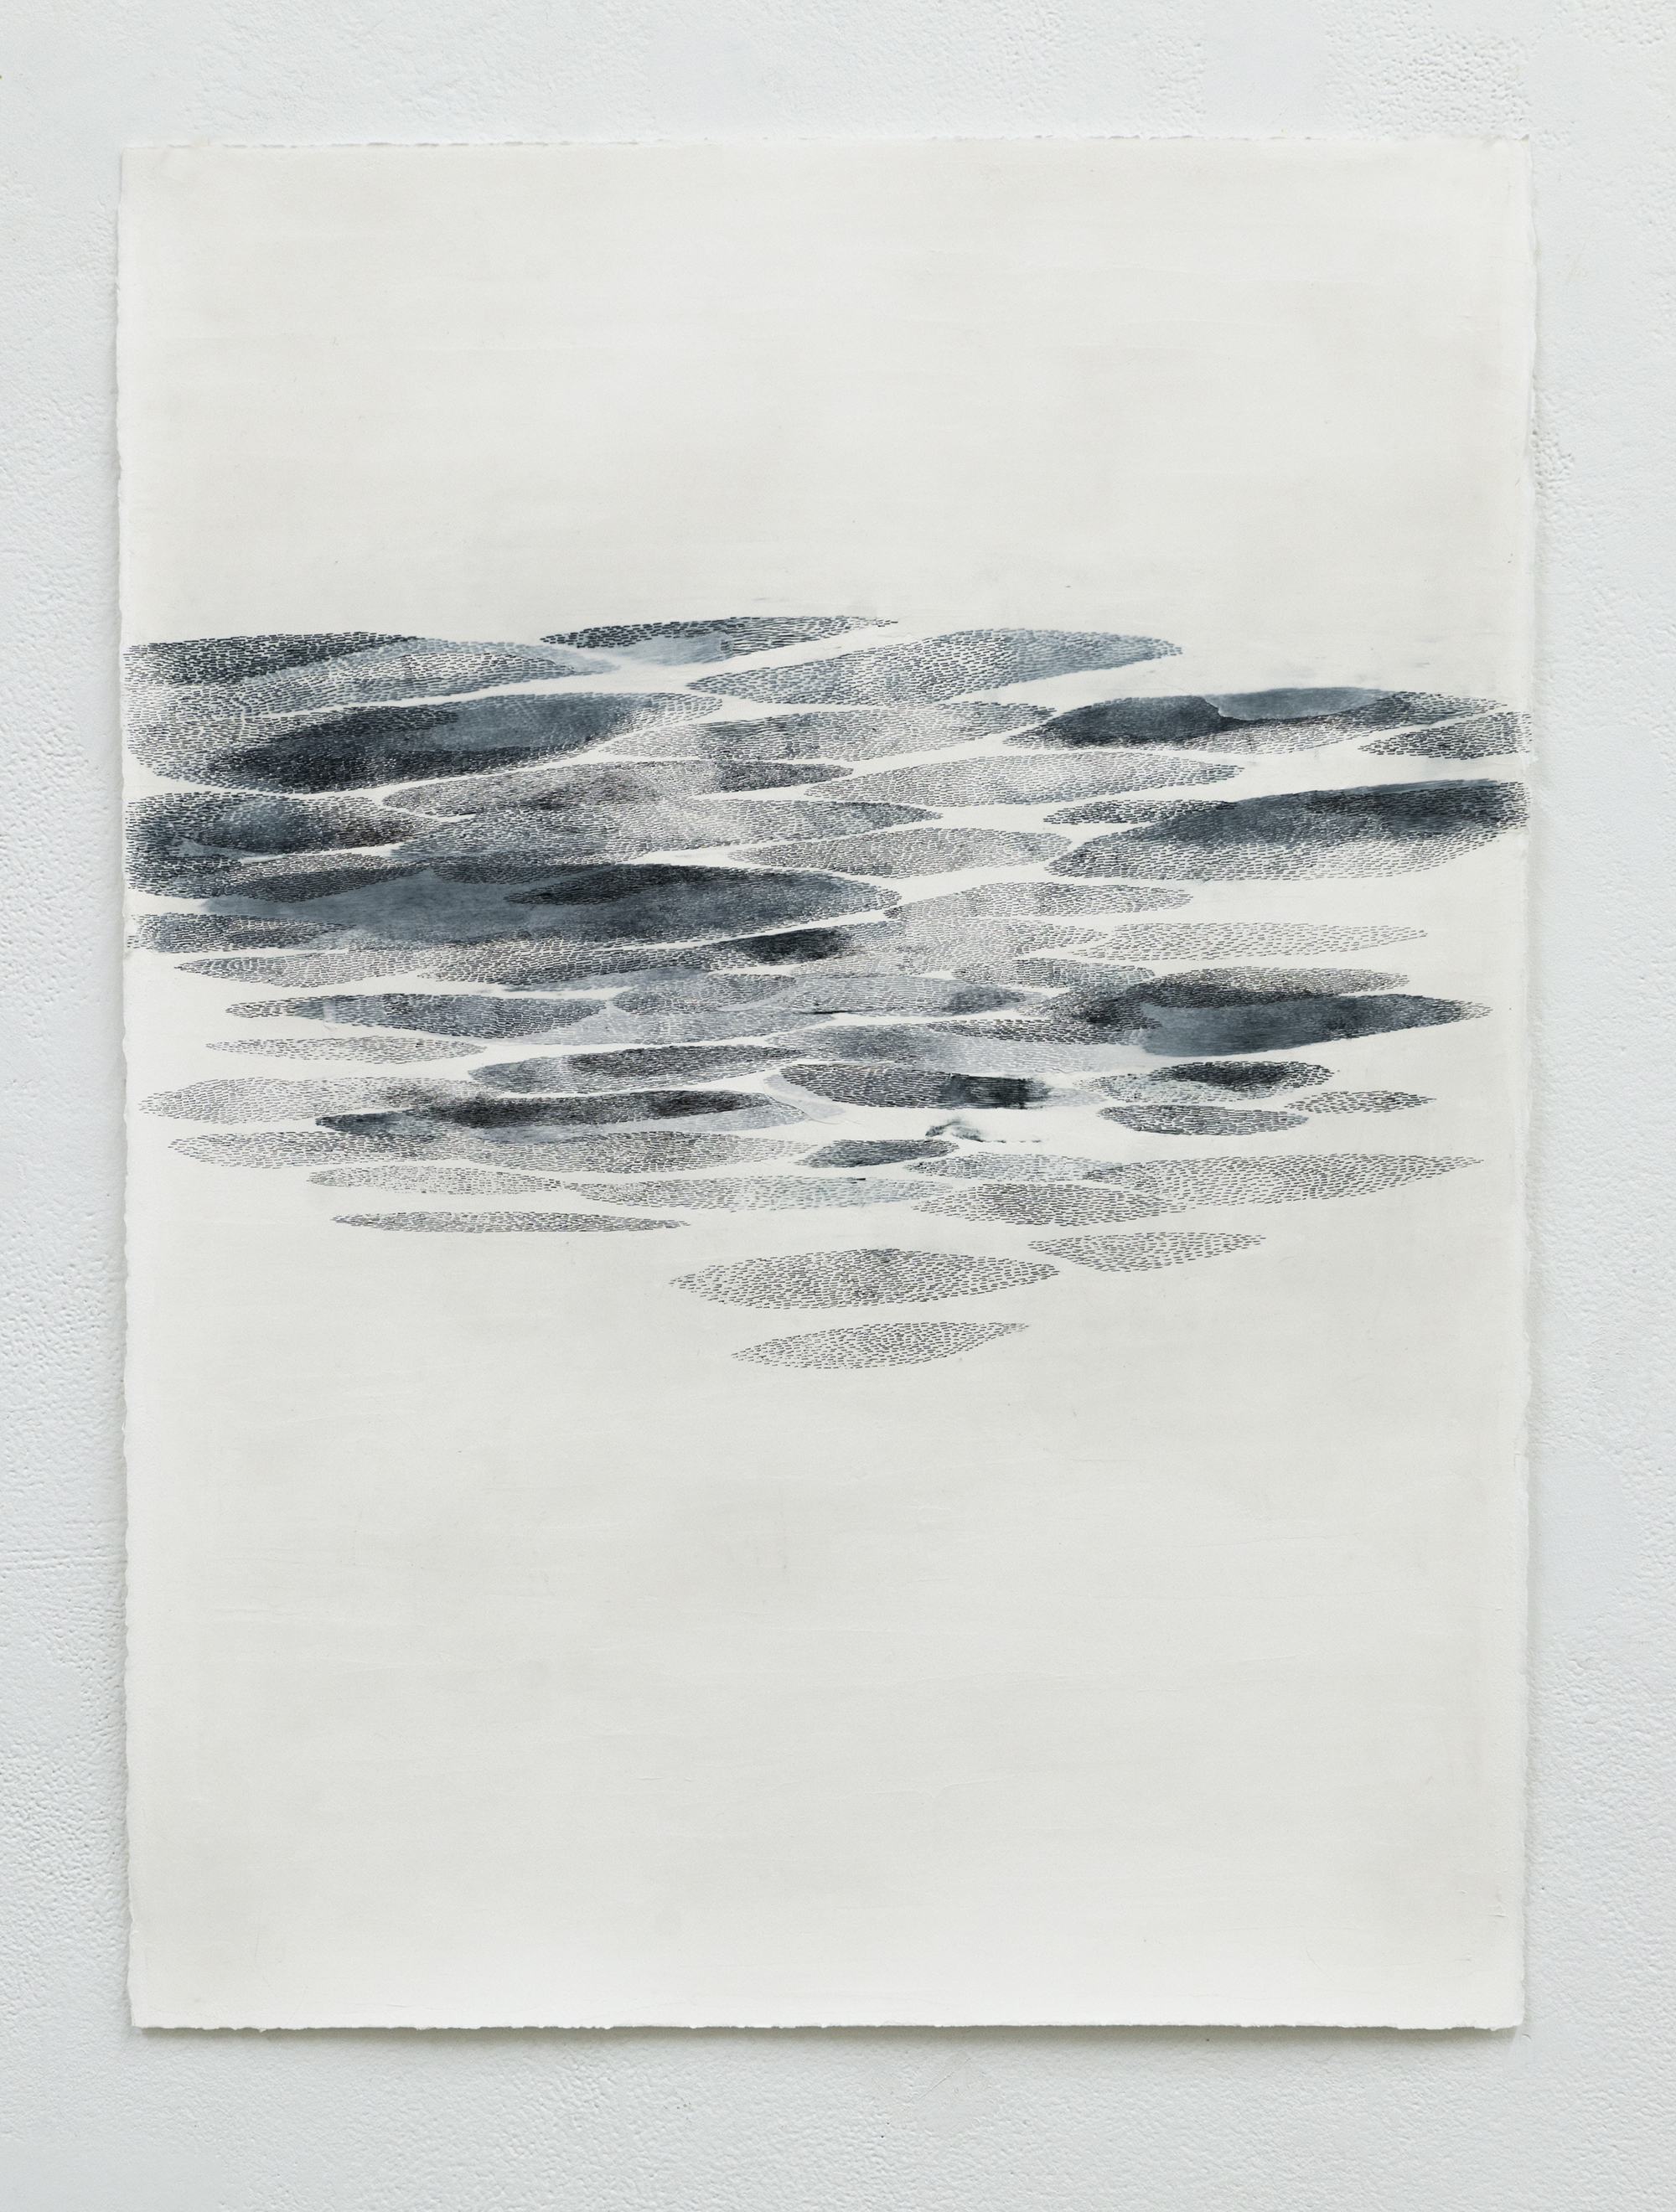 Untitled (Surge), 2017